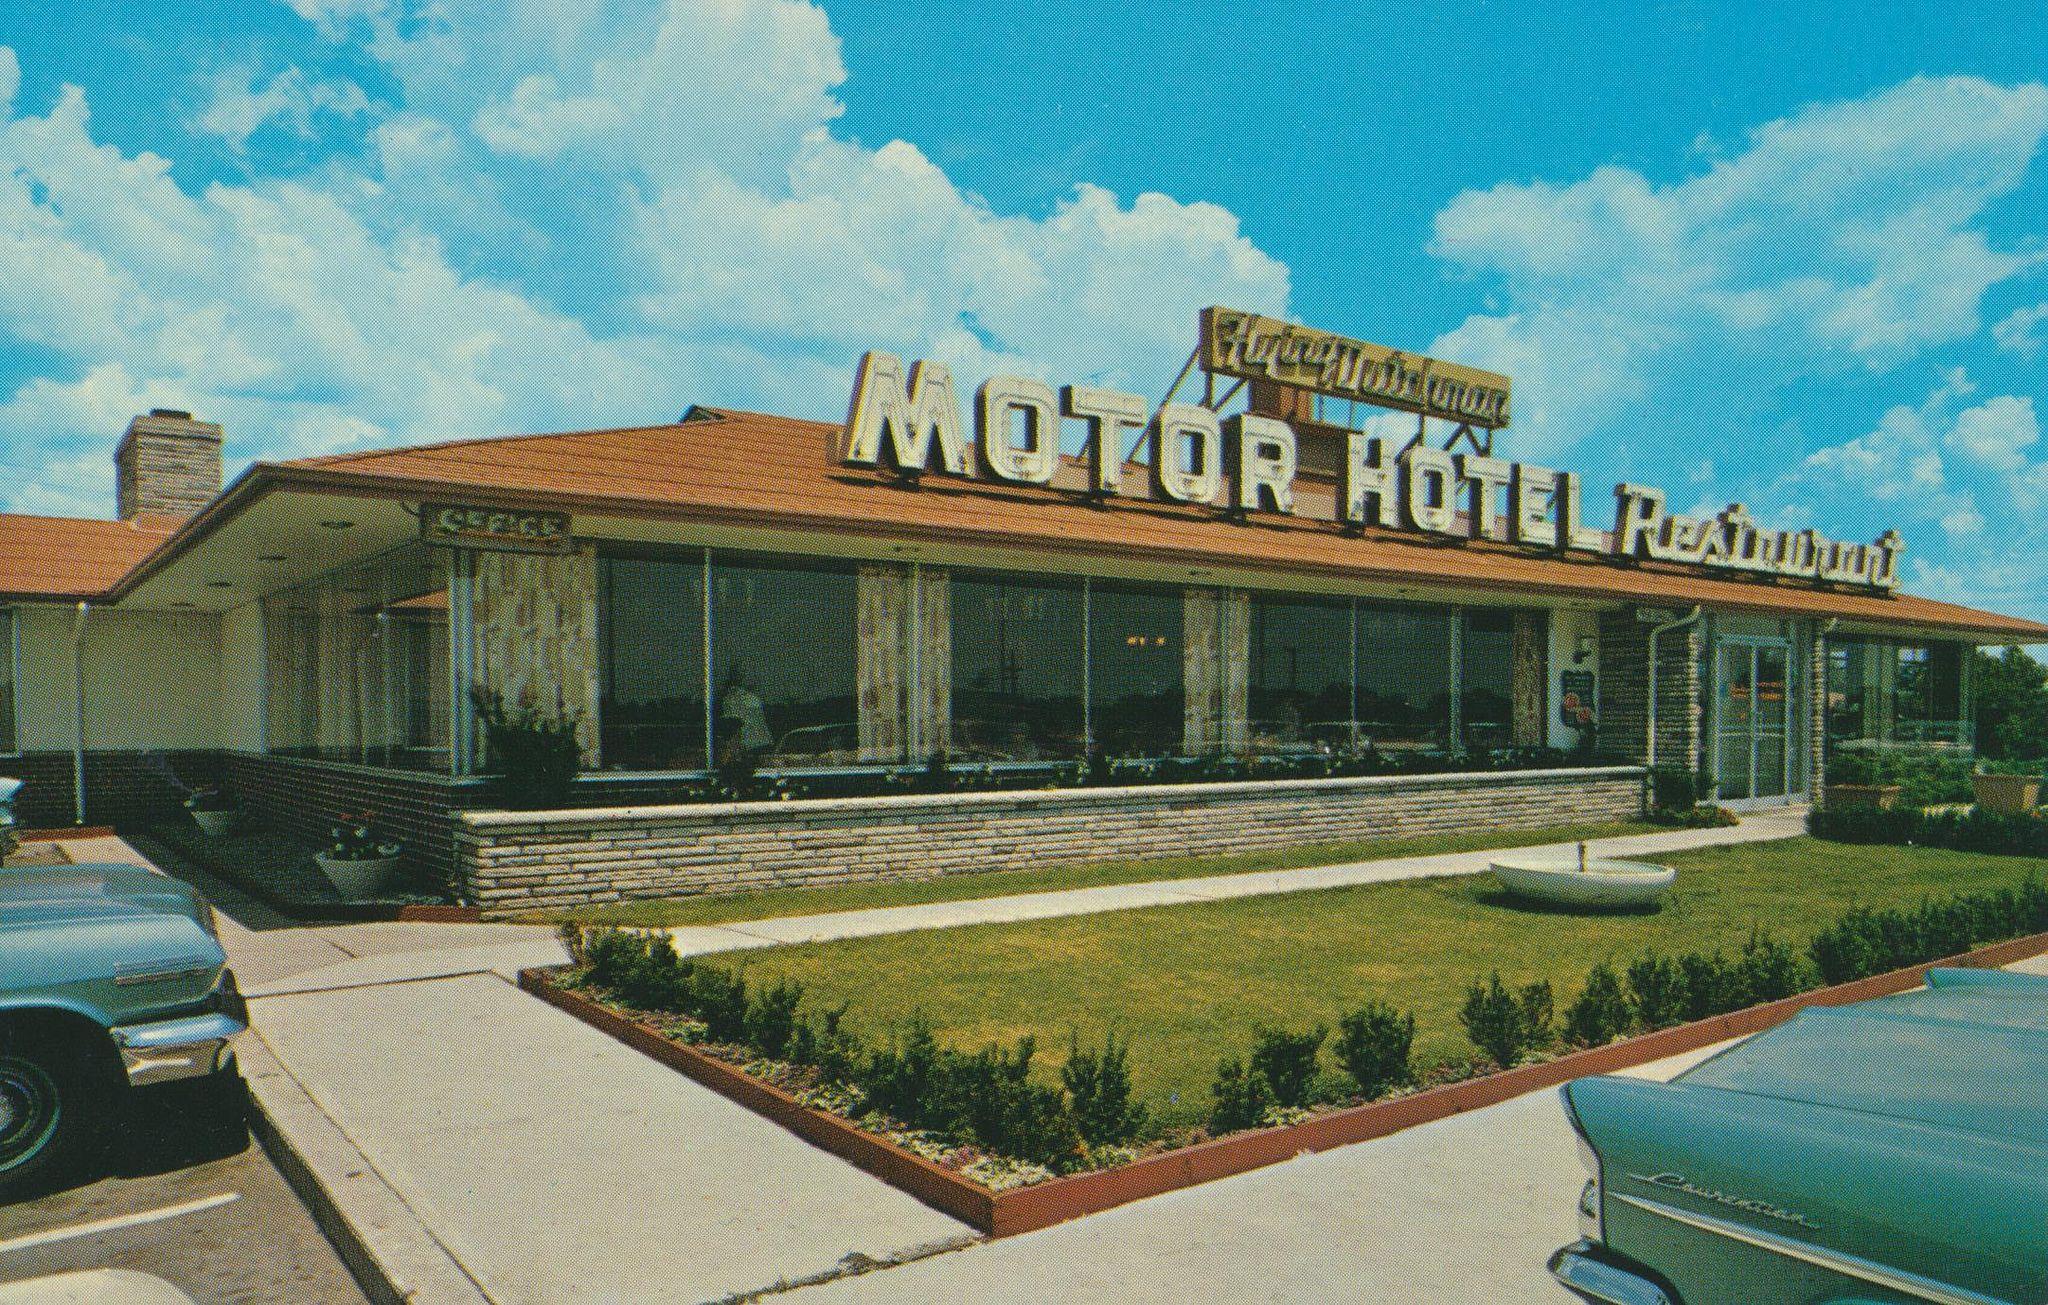 Flying Dutchman Motor Hotel